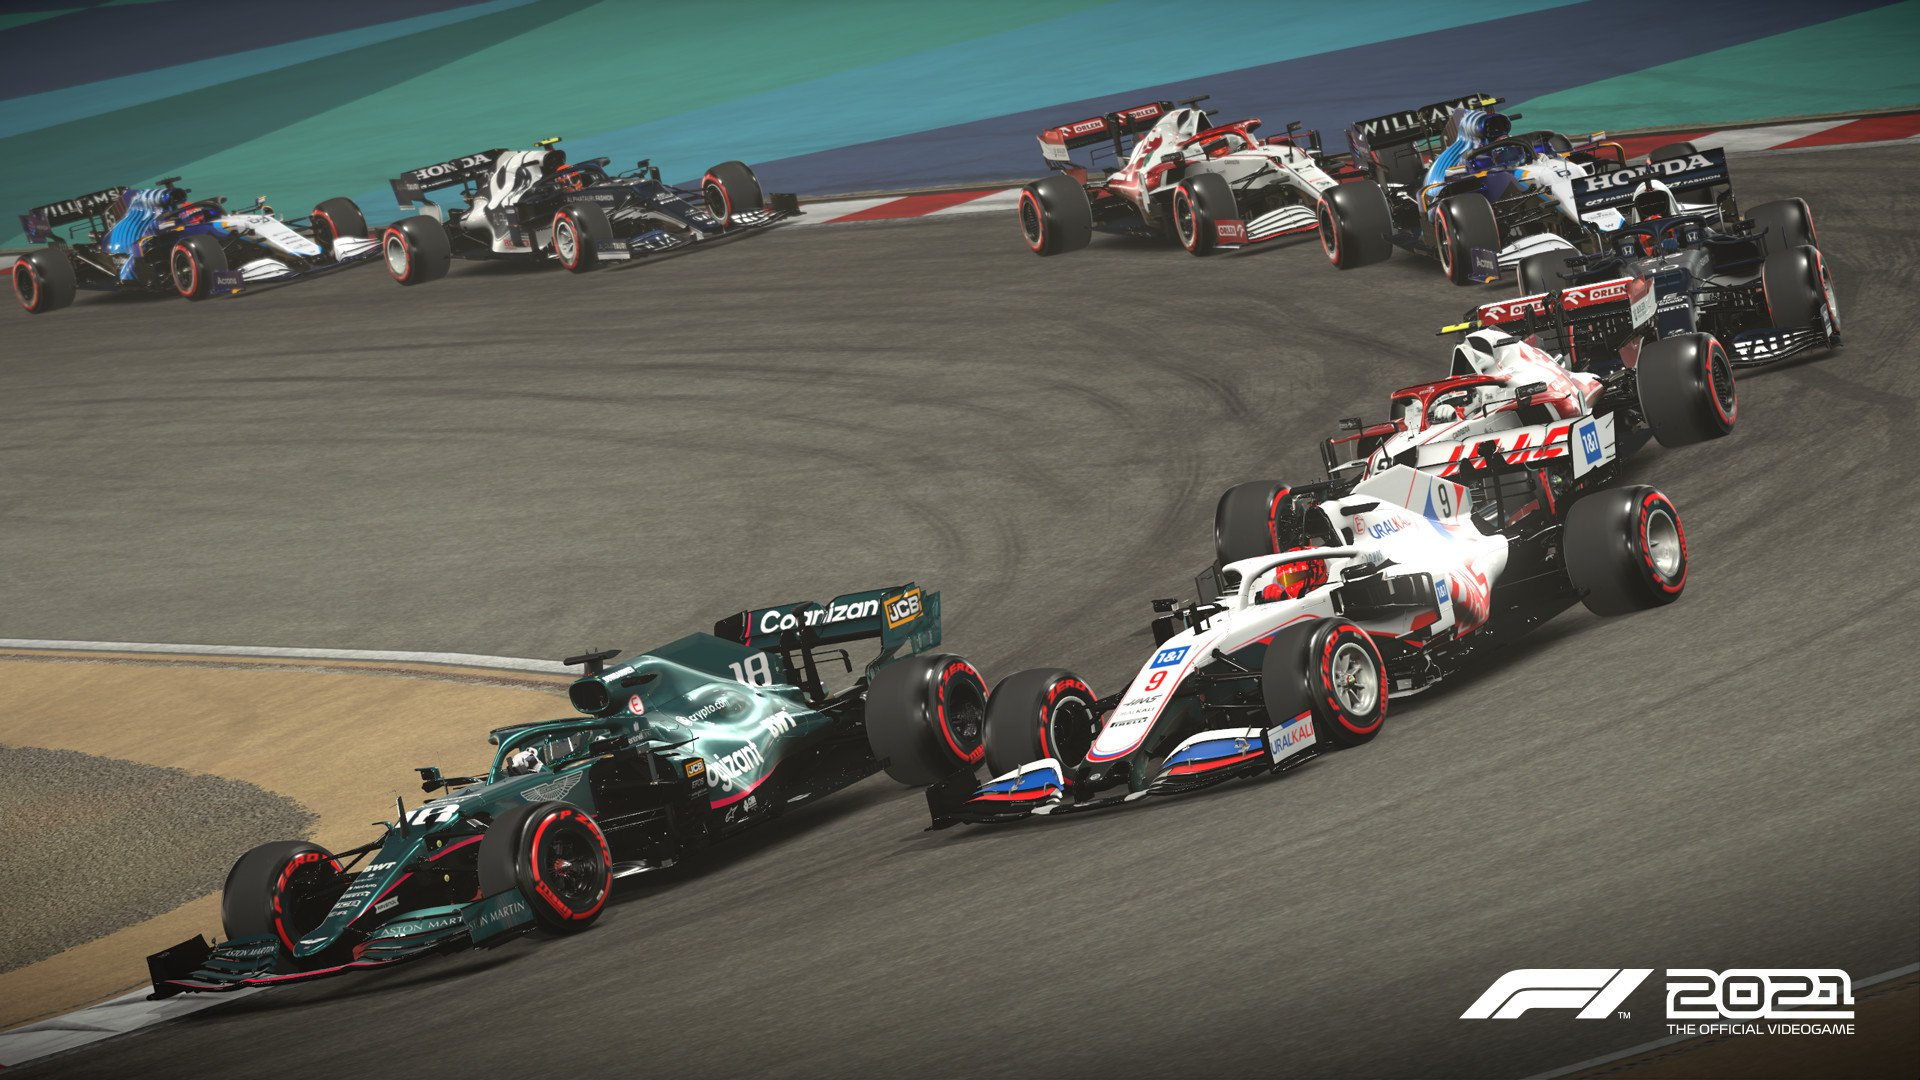 F1 2021 9